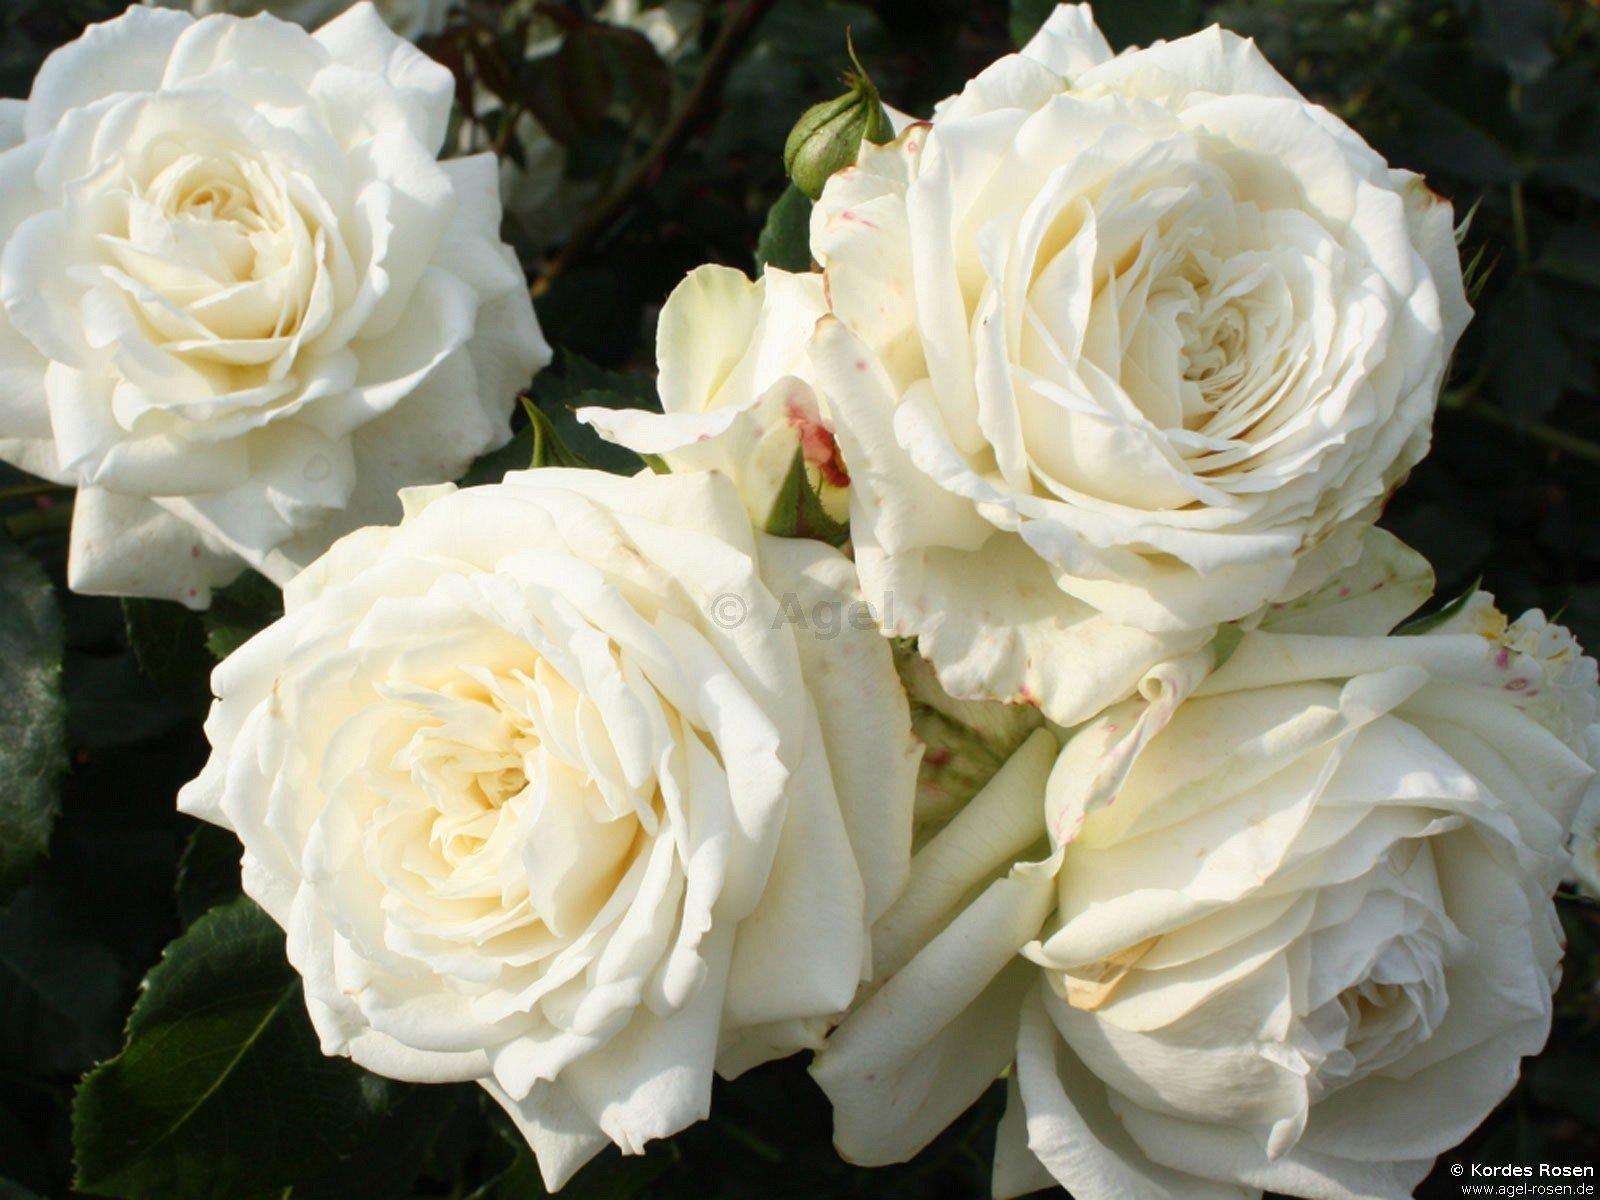 alaska climbing rose buy at agel rosen. Black Bedroom Furniture Sets. Home Design Ideas